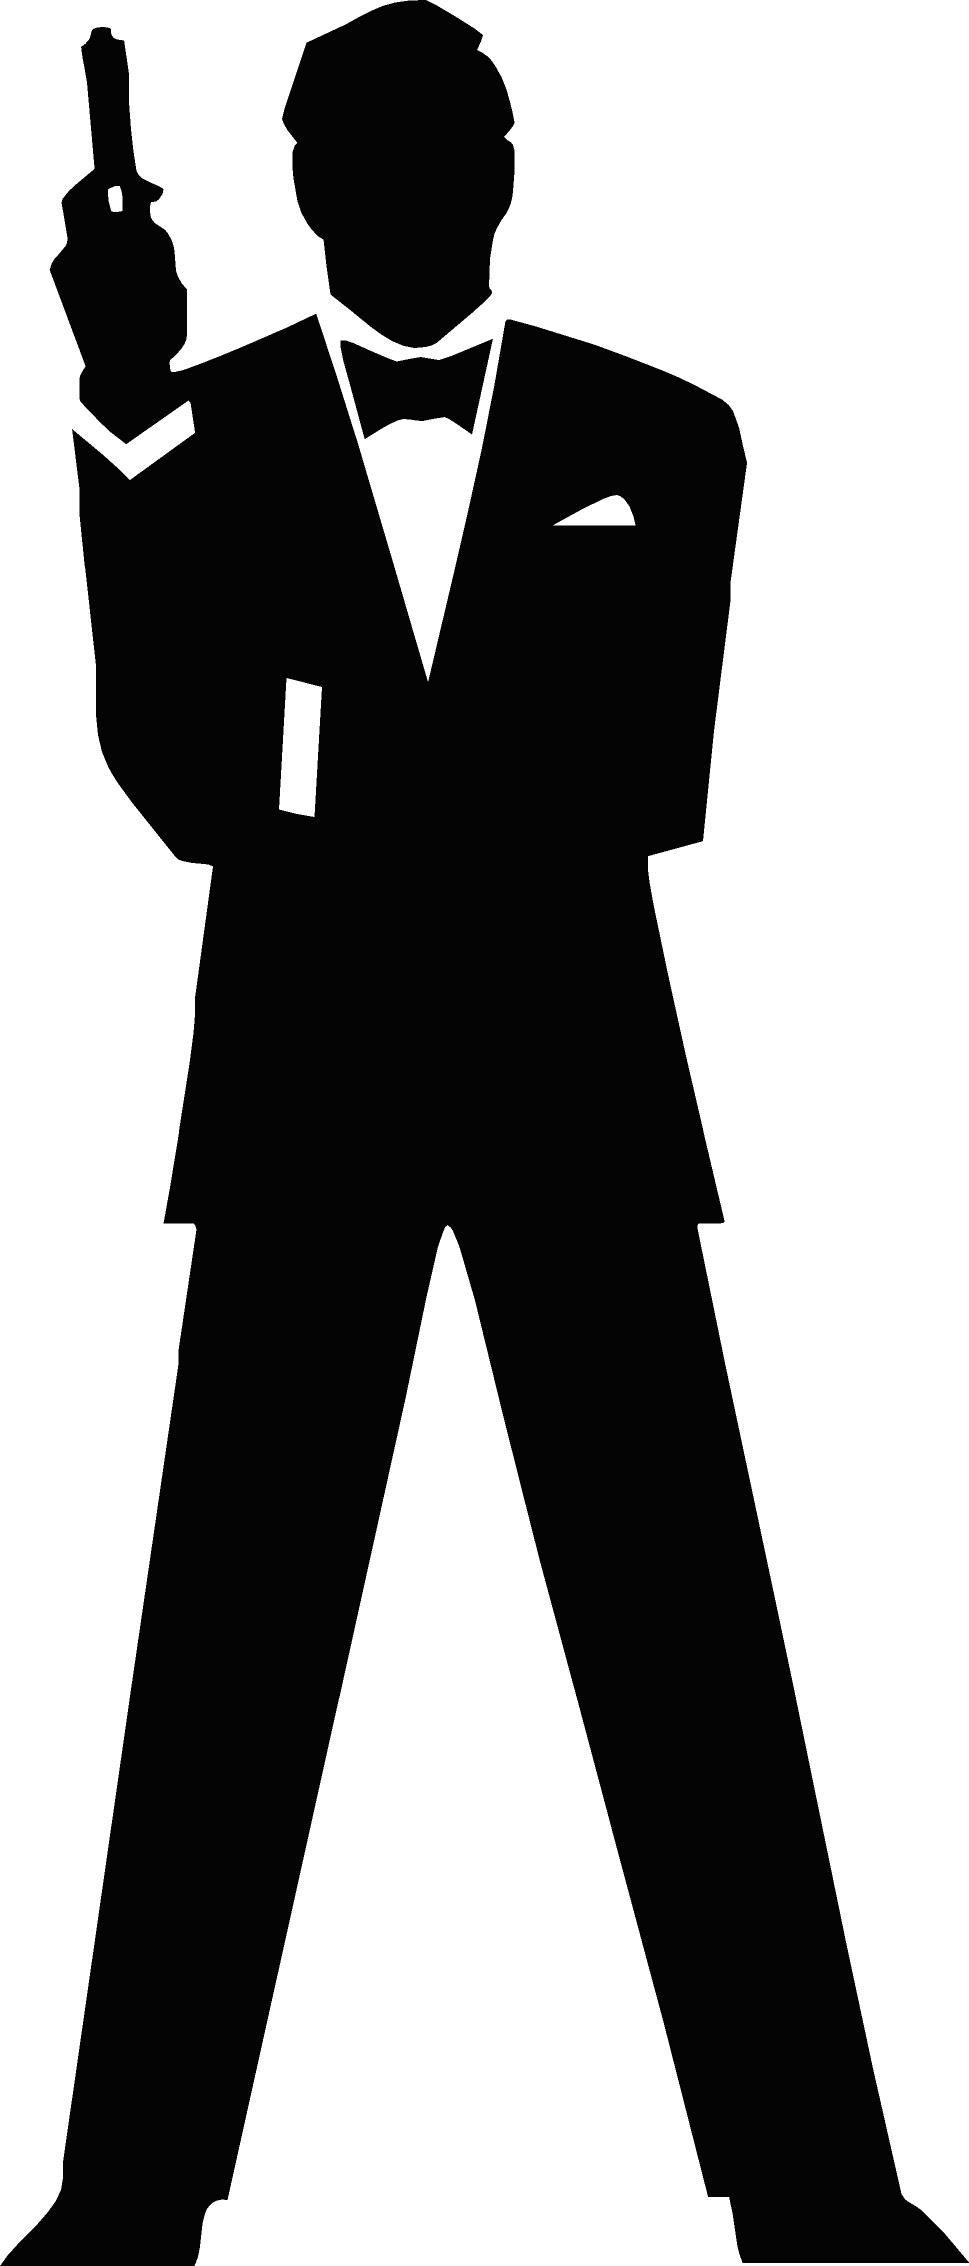 free vector James Bond Secret Agent 007 Black & White Silo.